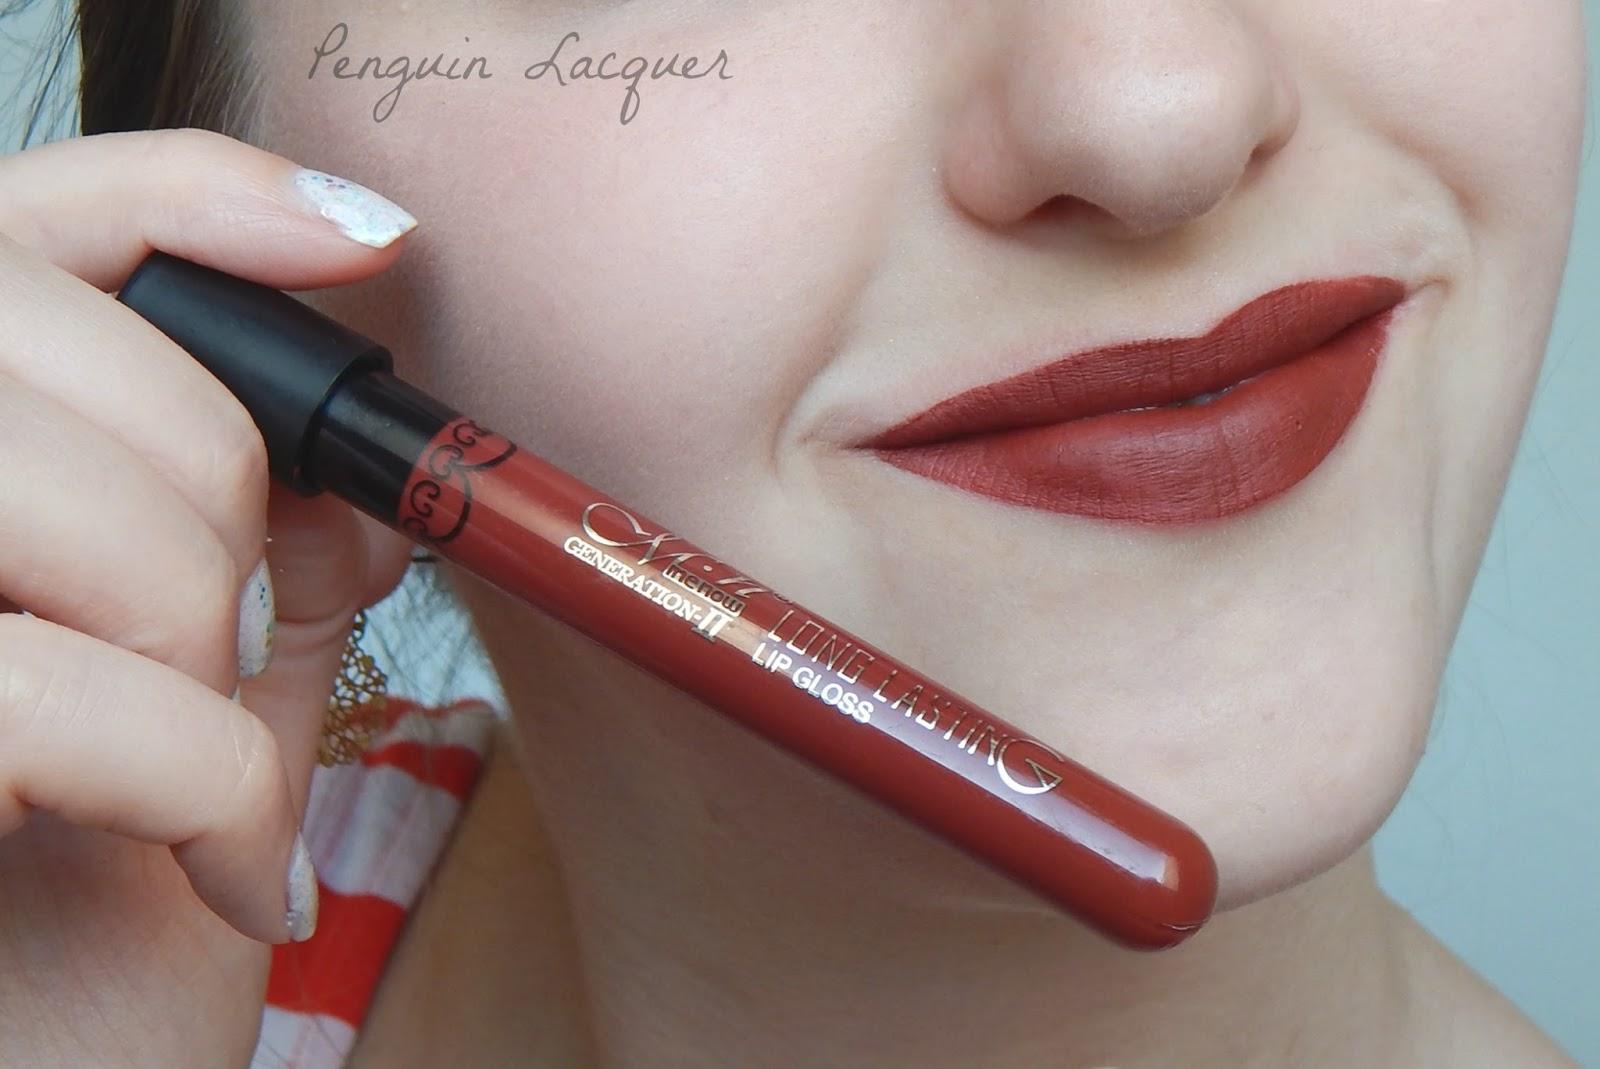 Born Pretty Store Longlasting Lipgloss 33 (mit Bildern)